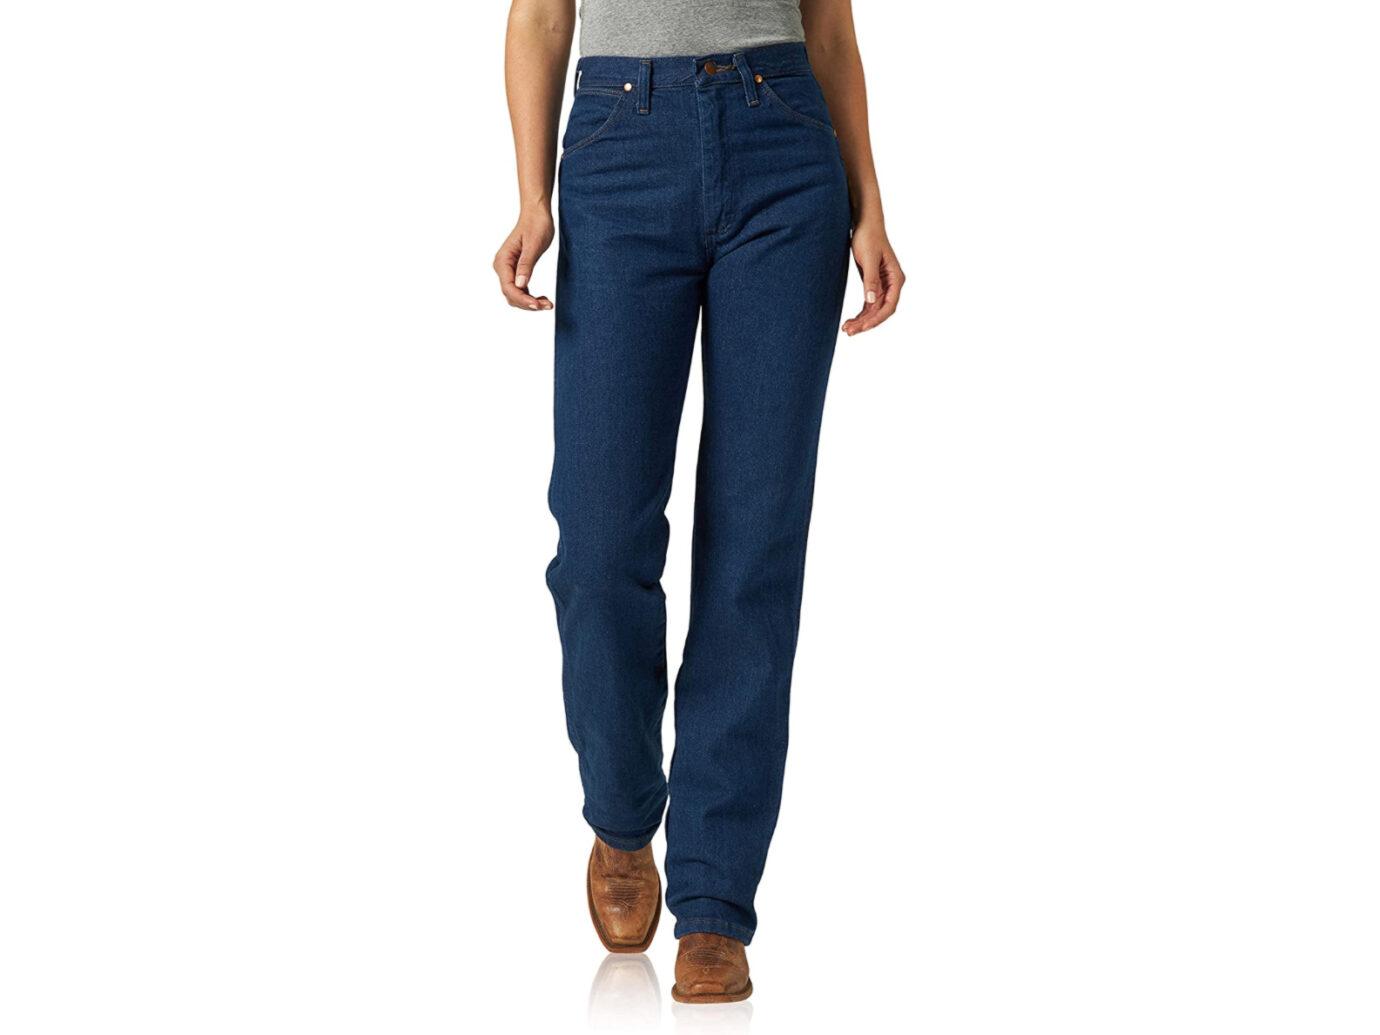 Wrangler Women's Cowboy Cut Slim Fit Natural Waist Jean